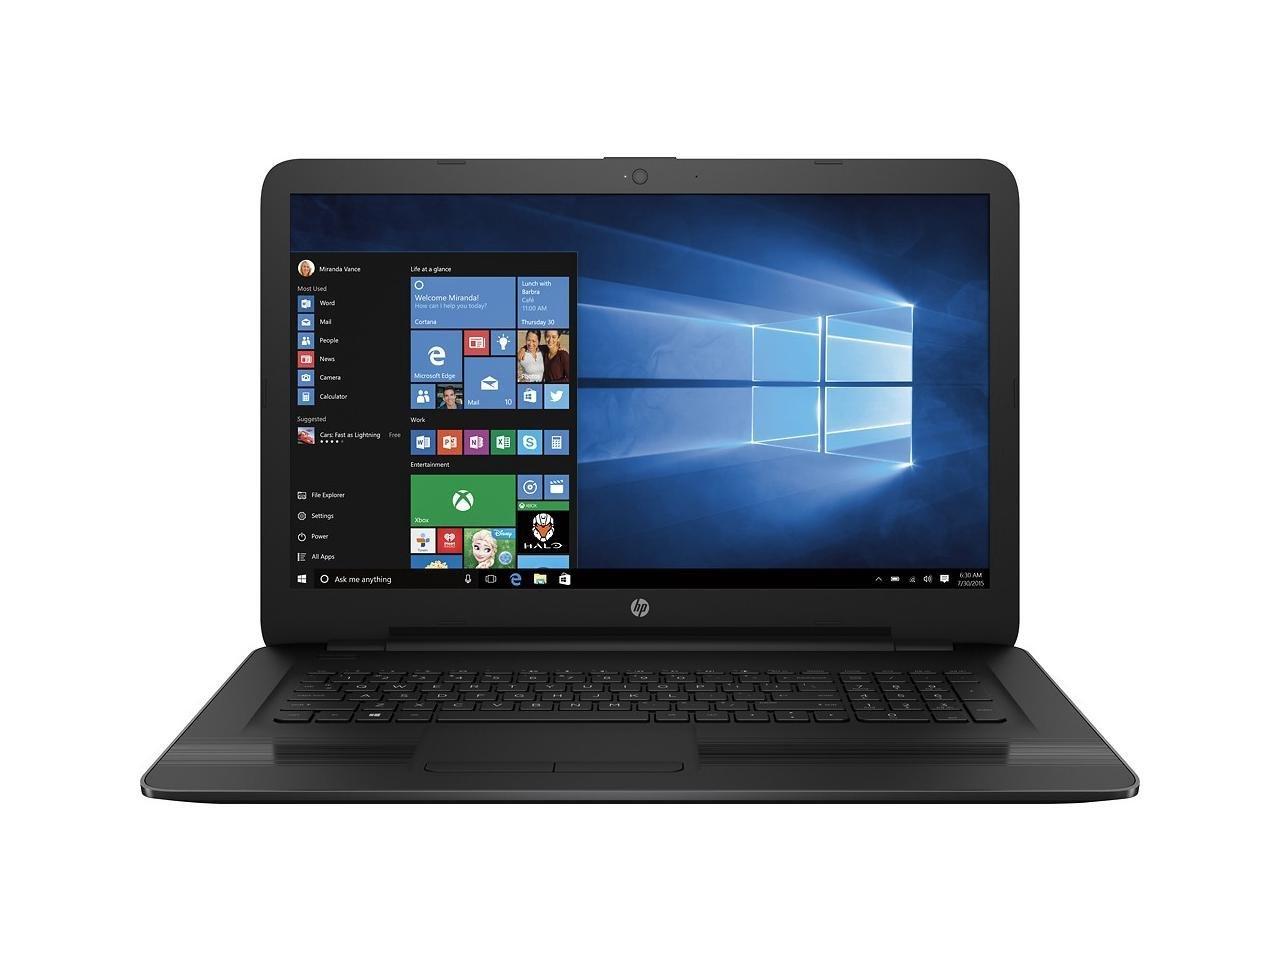 Samsung Chromebook 3 Laptop